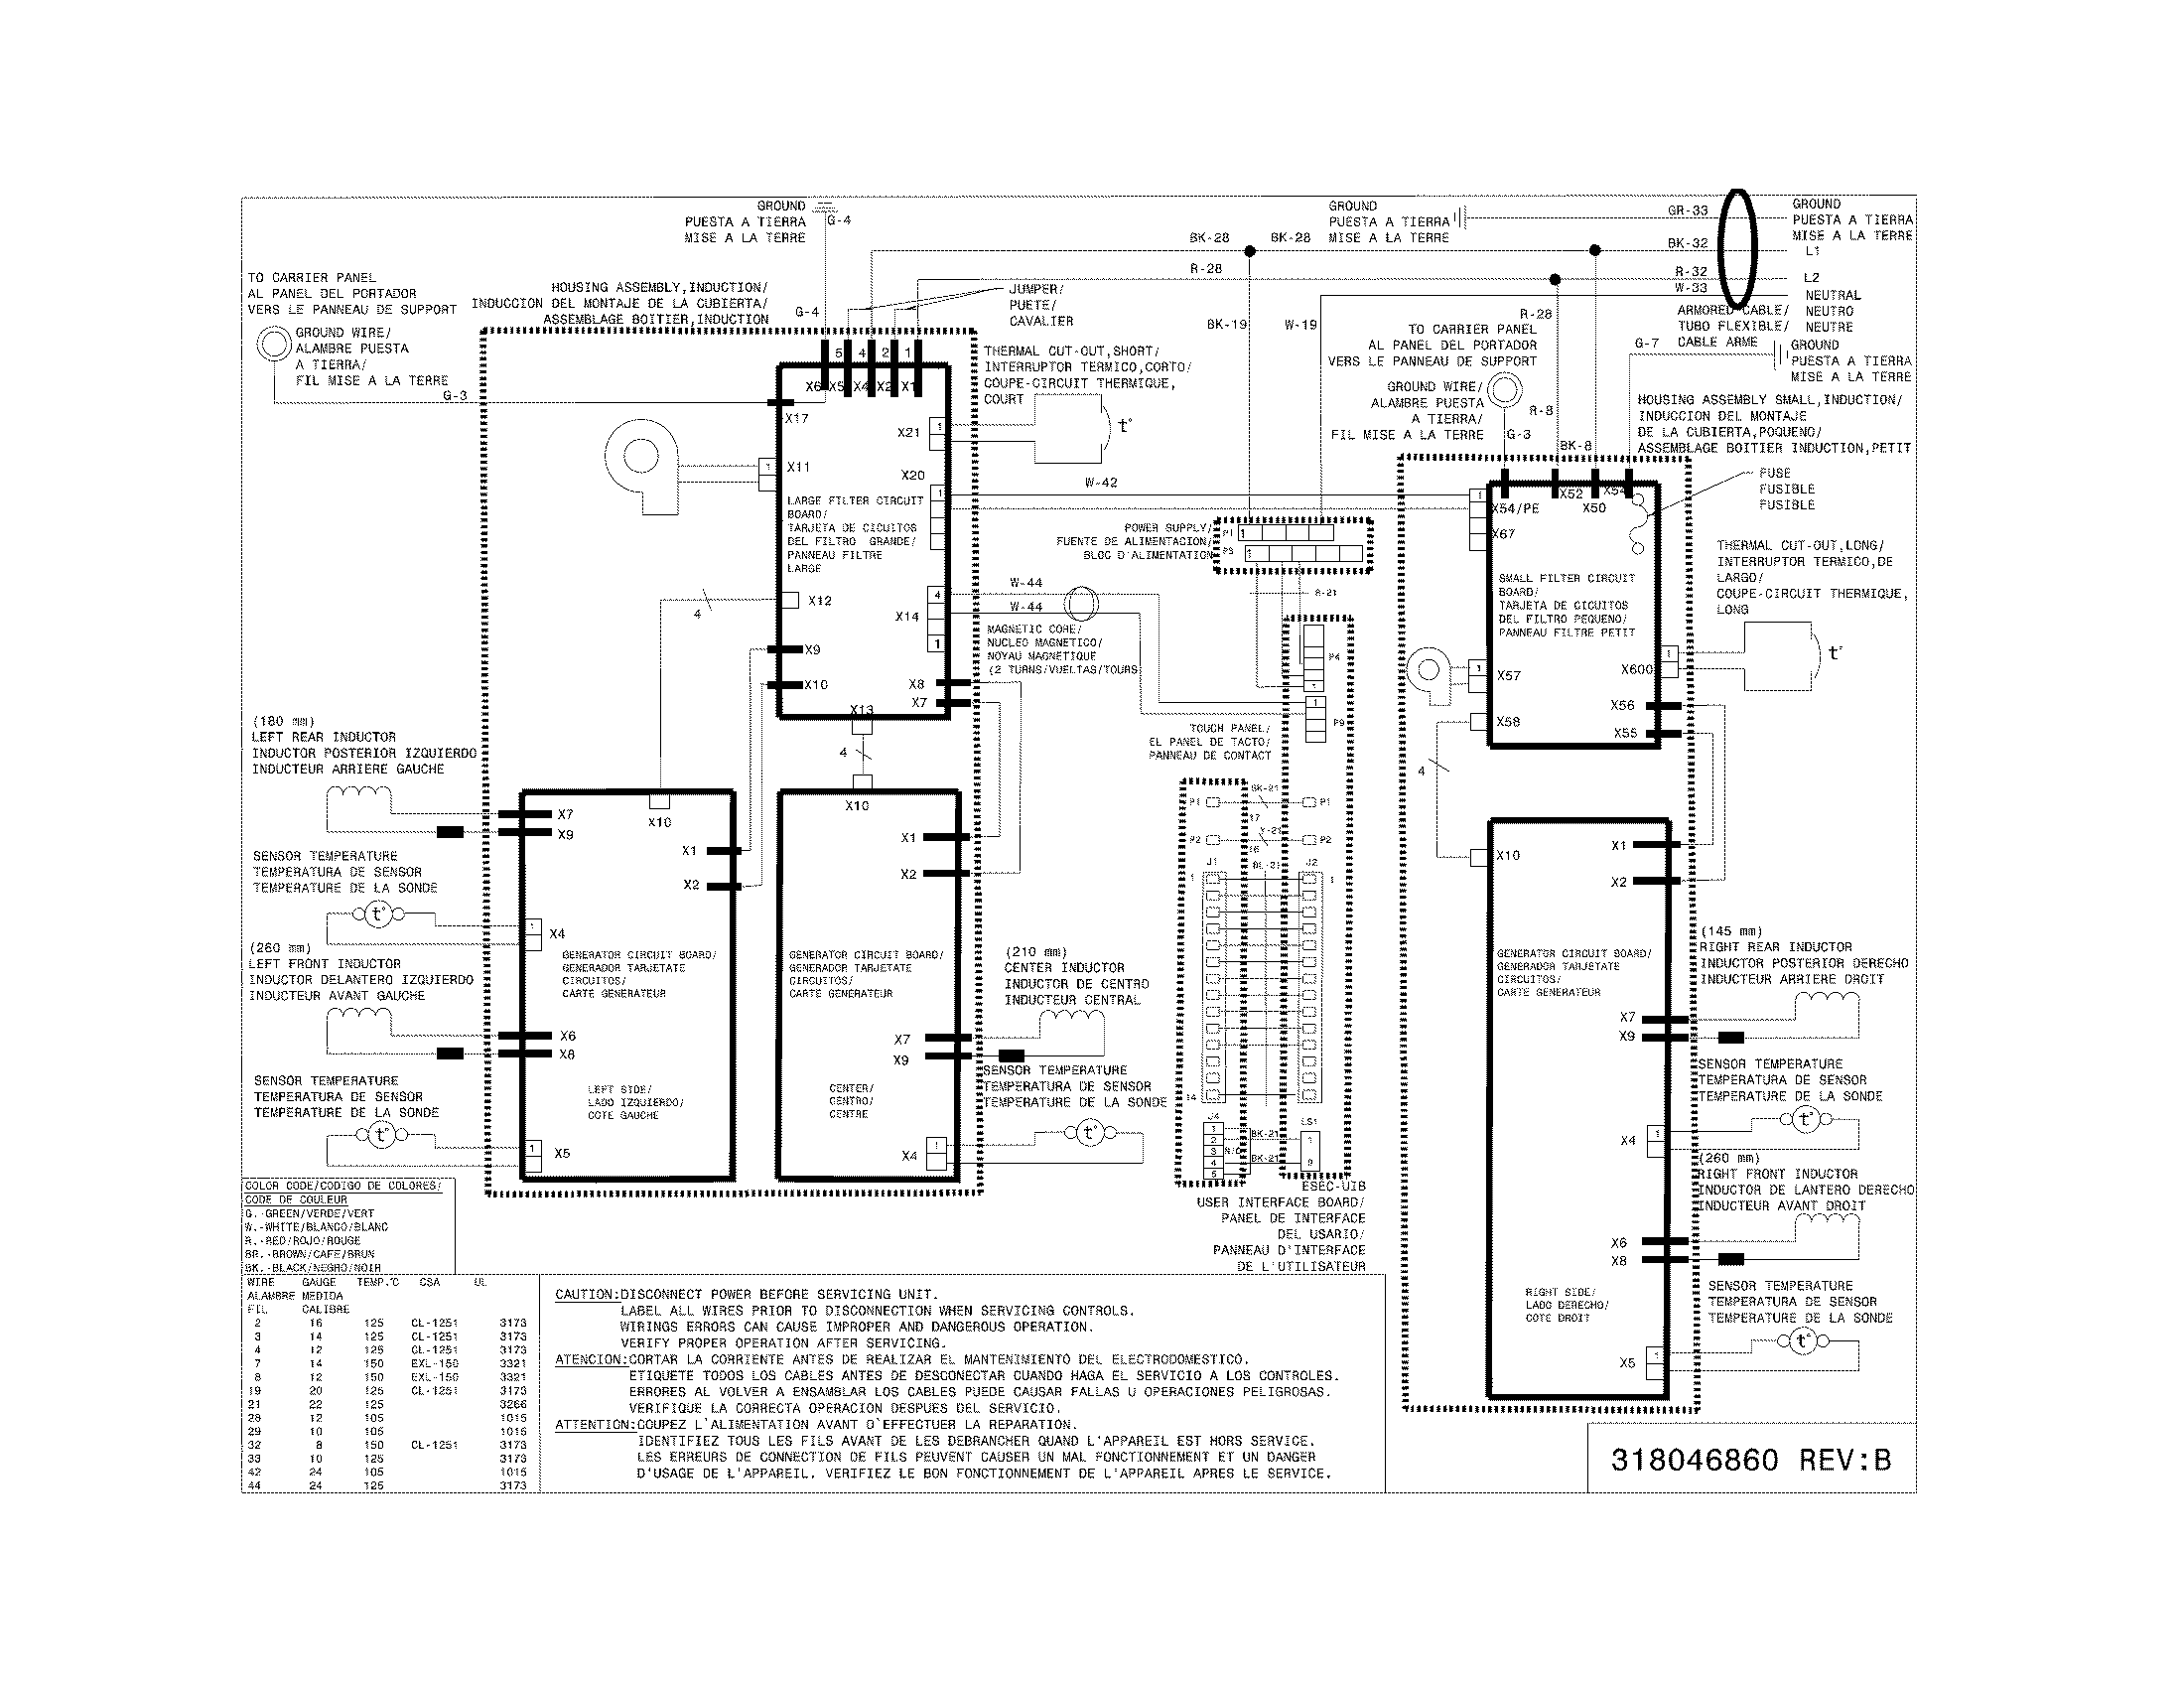 Wh5 120 L Ballast Wiring Diagram Fluorescent Light Ballast